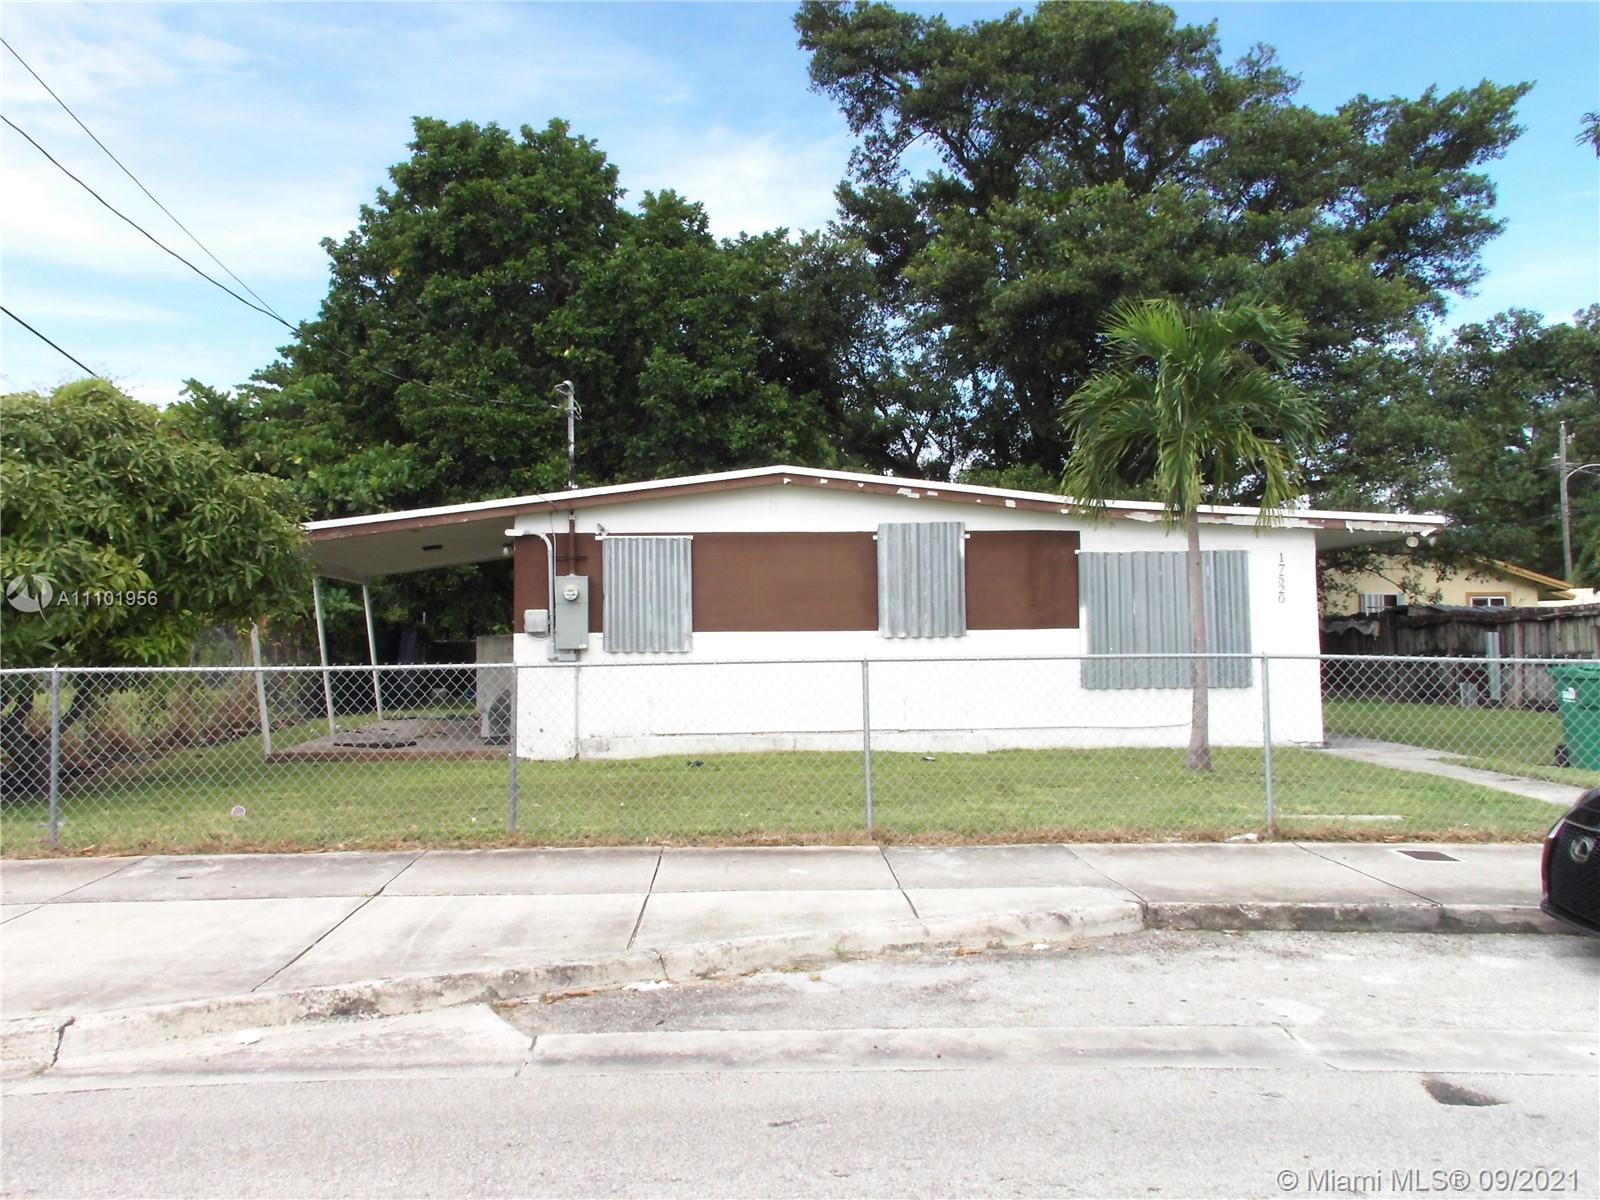 Single Family Home,For Sale,17520 Homestead Ave, Miami, Florida 33157,Brickell,realty,broker,condos near me